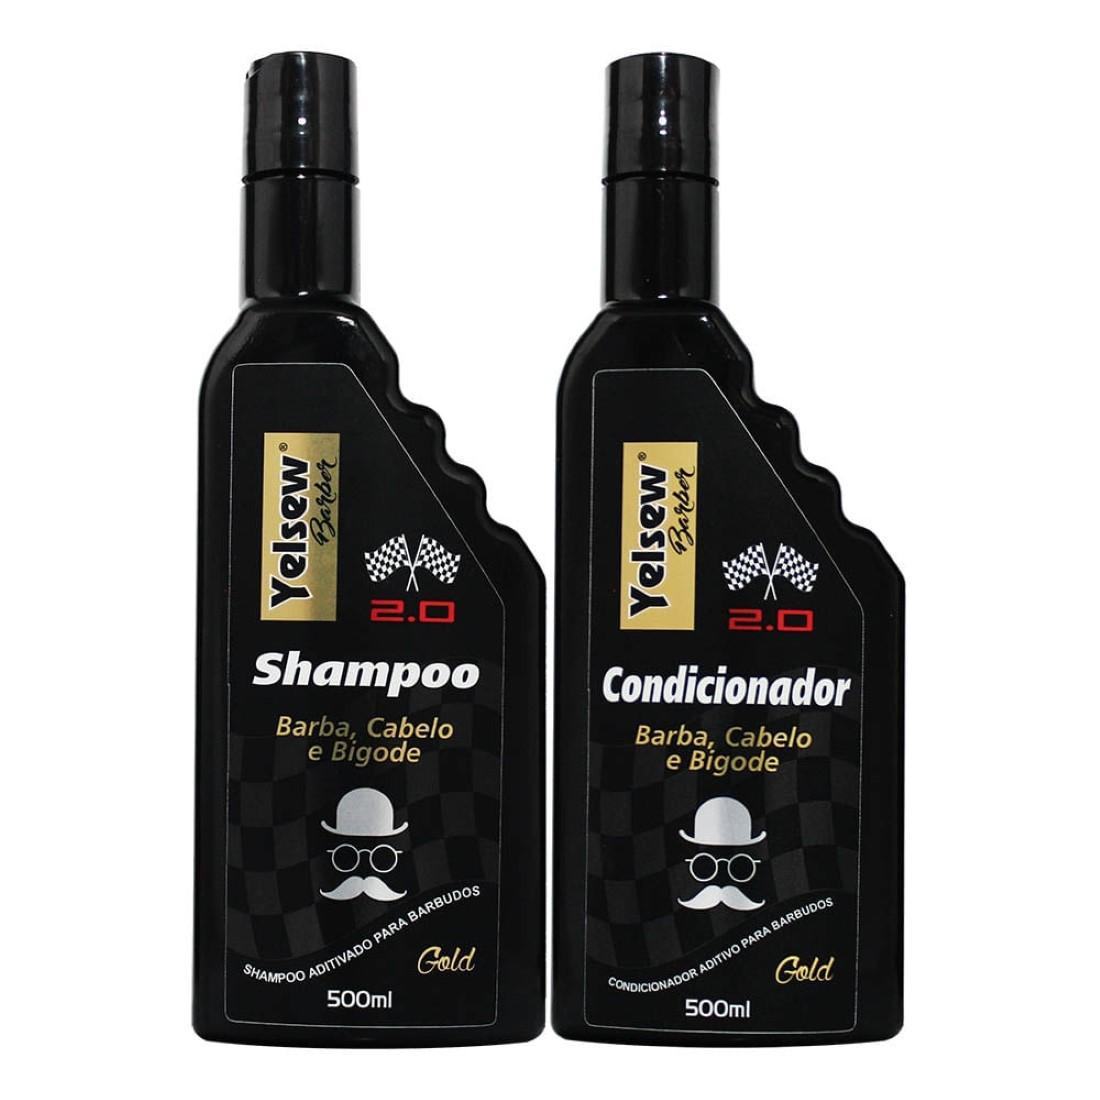 Kit Shampoo e Condicionador Gold Barber 2.0 500ml - Yelsew